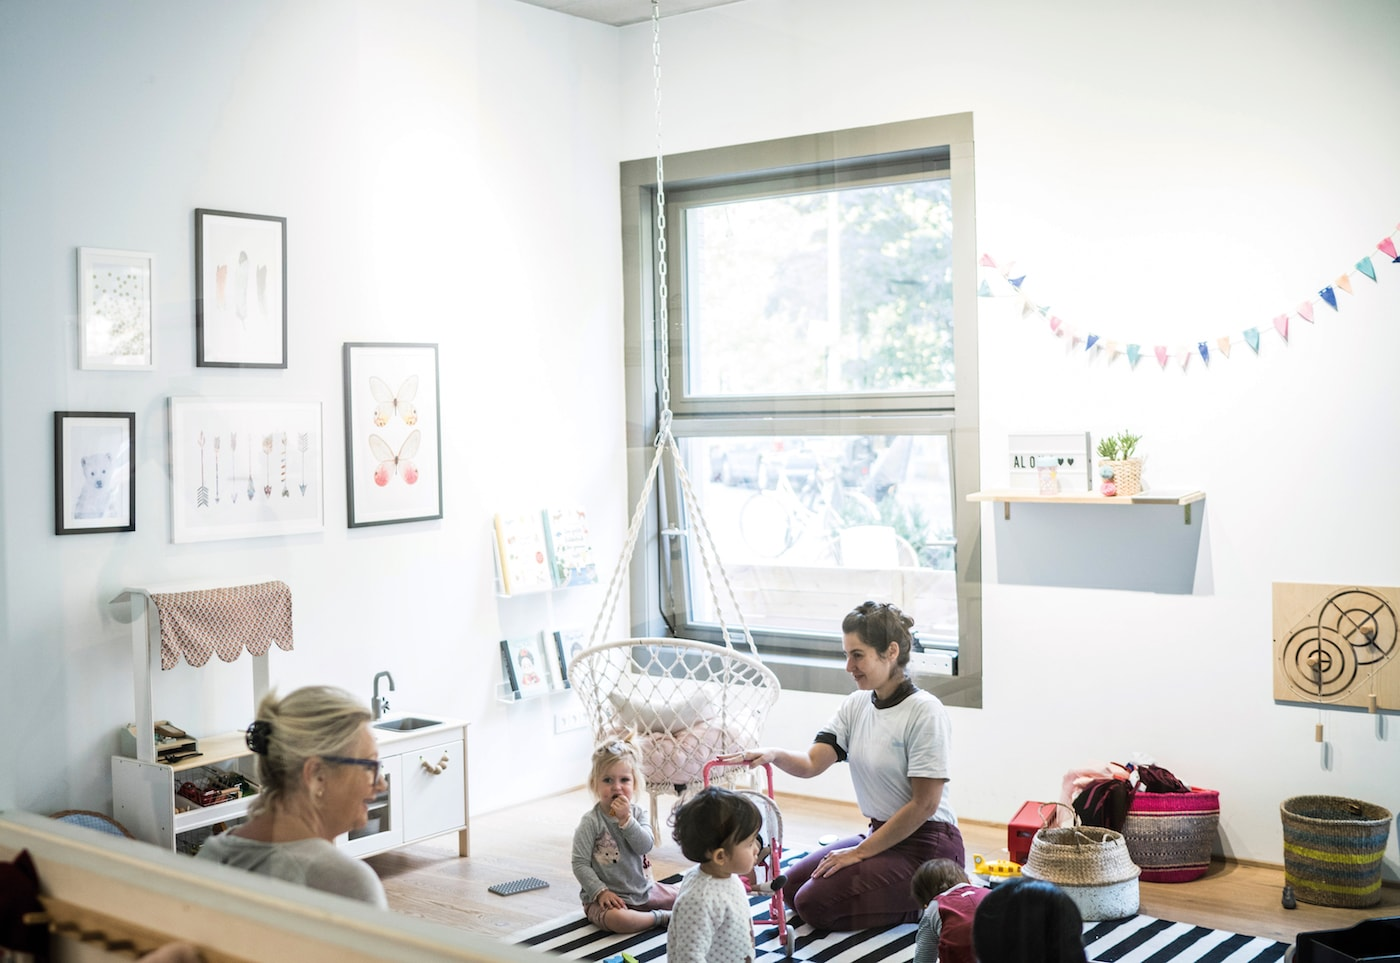 Kinderbetreuung im Eltern-Kind-Café Wunderhaus Berlin-Prenzlauer Berg // HIMBEER